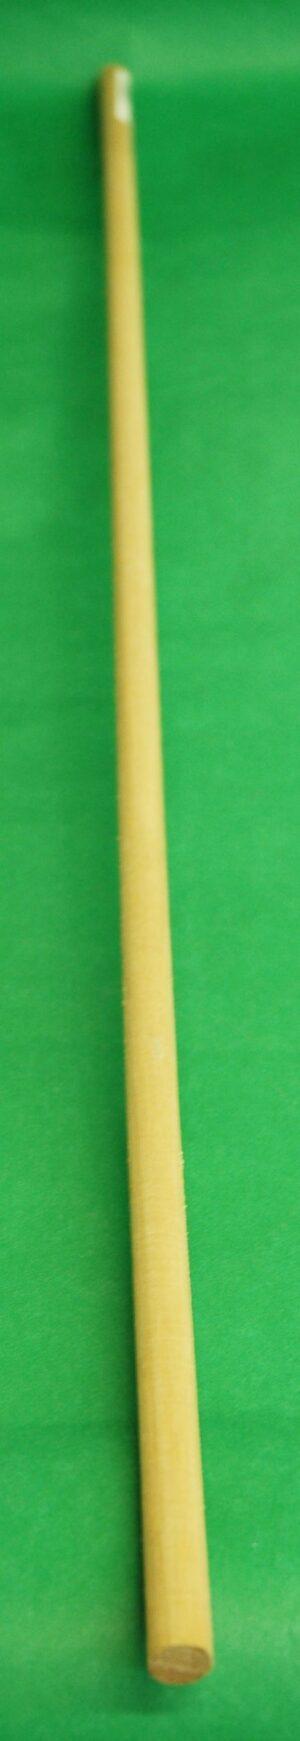 p 3994 DOWEL